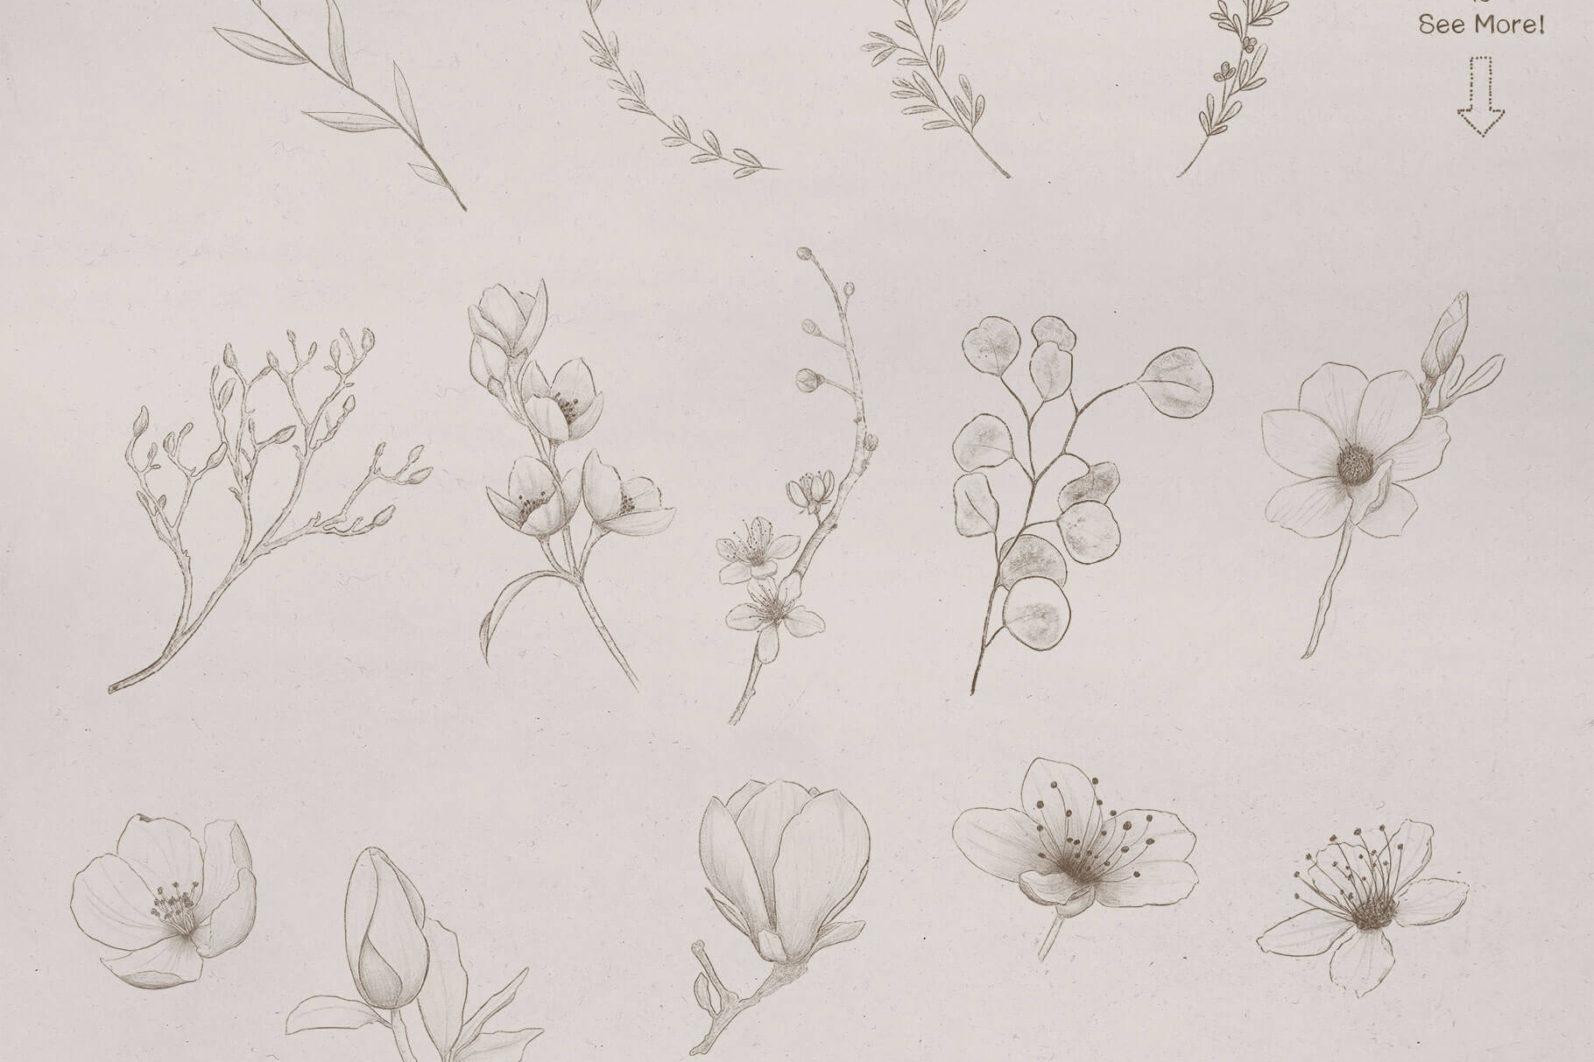 Sketchy Floral Wreaths & Borders - sketchy botanicals page -